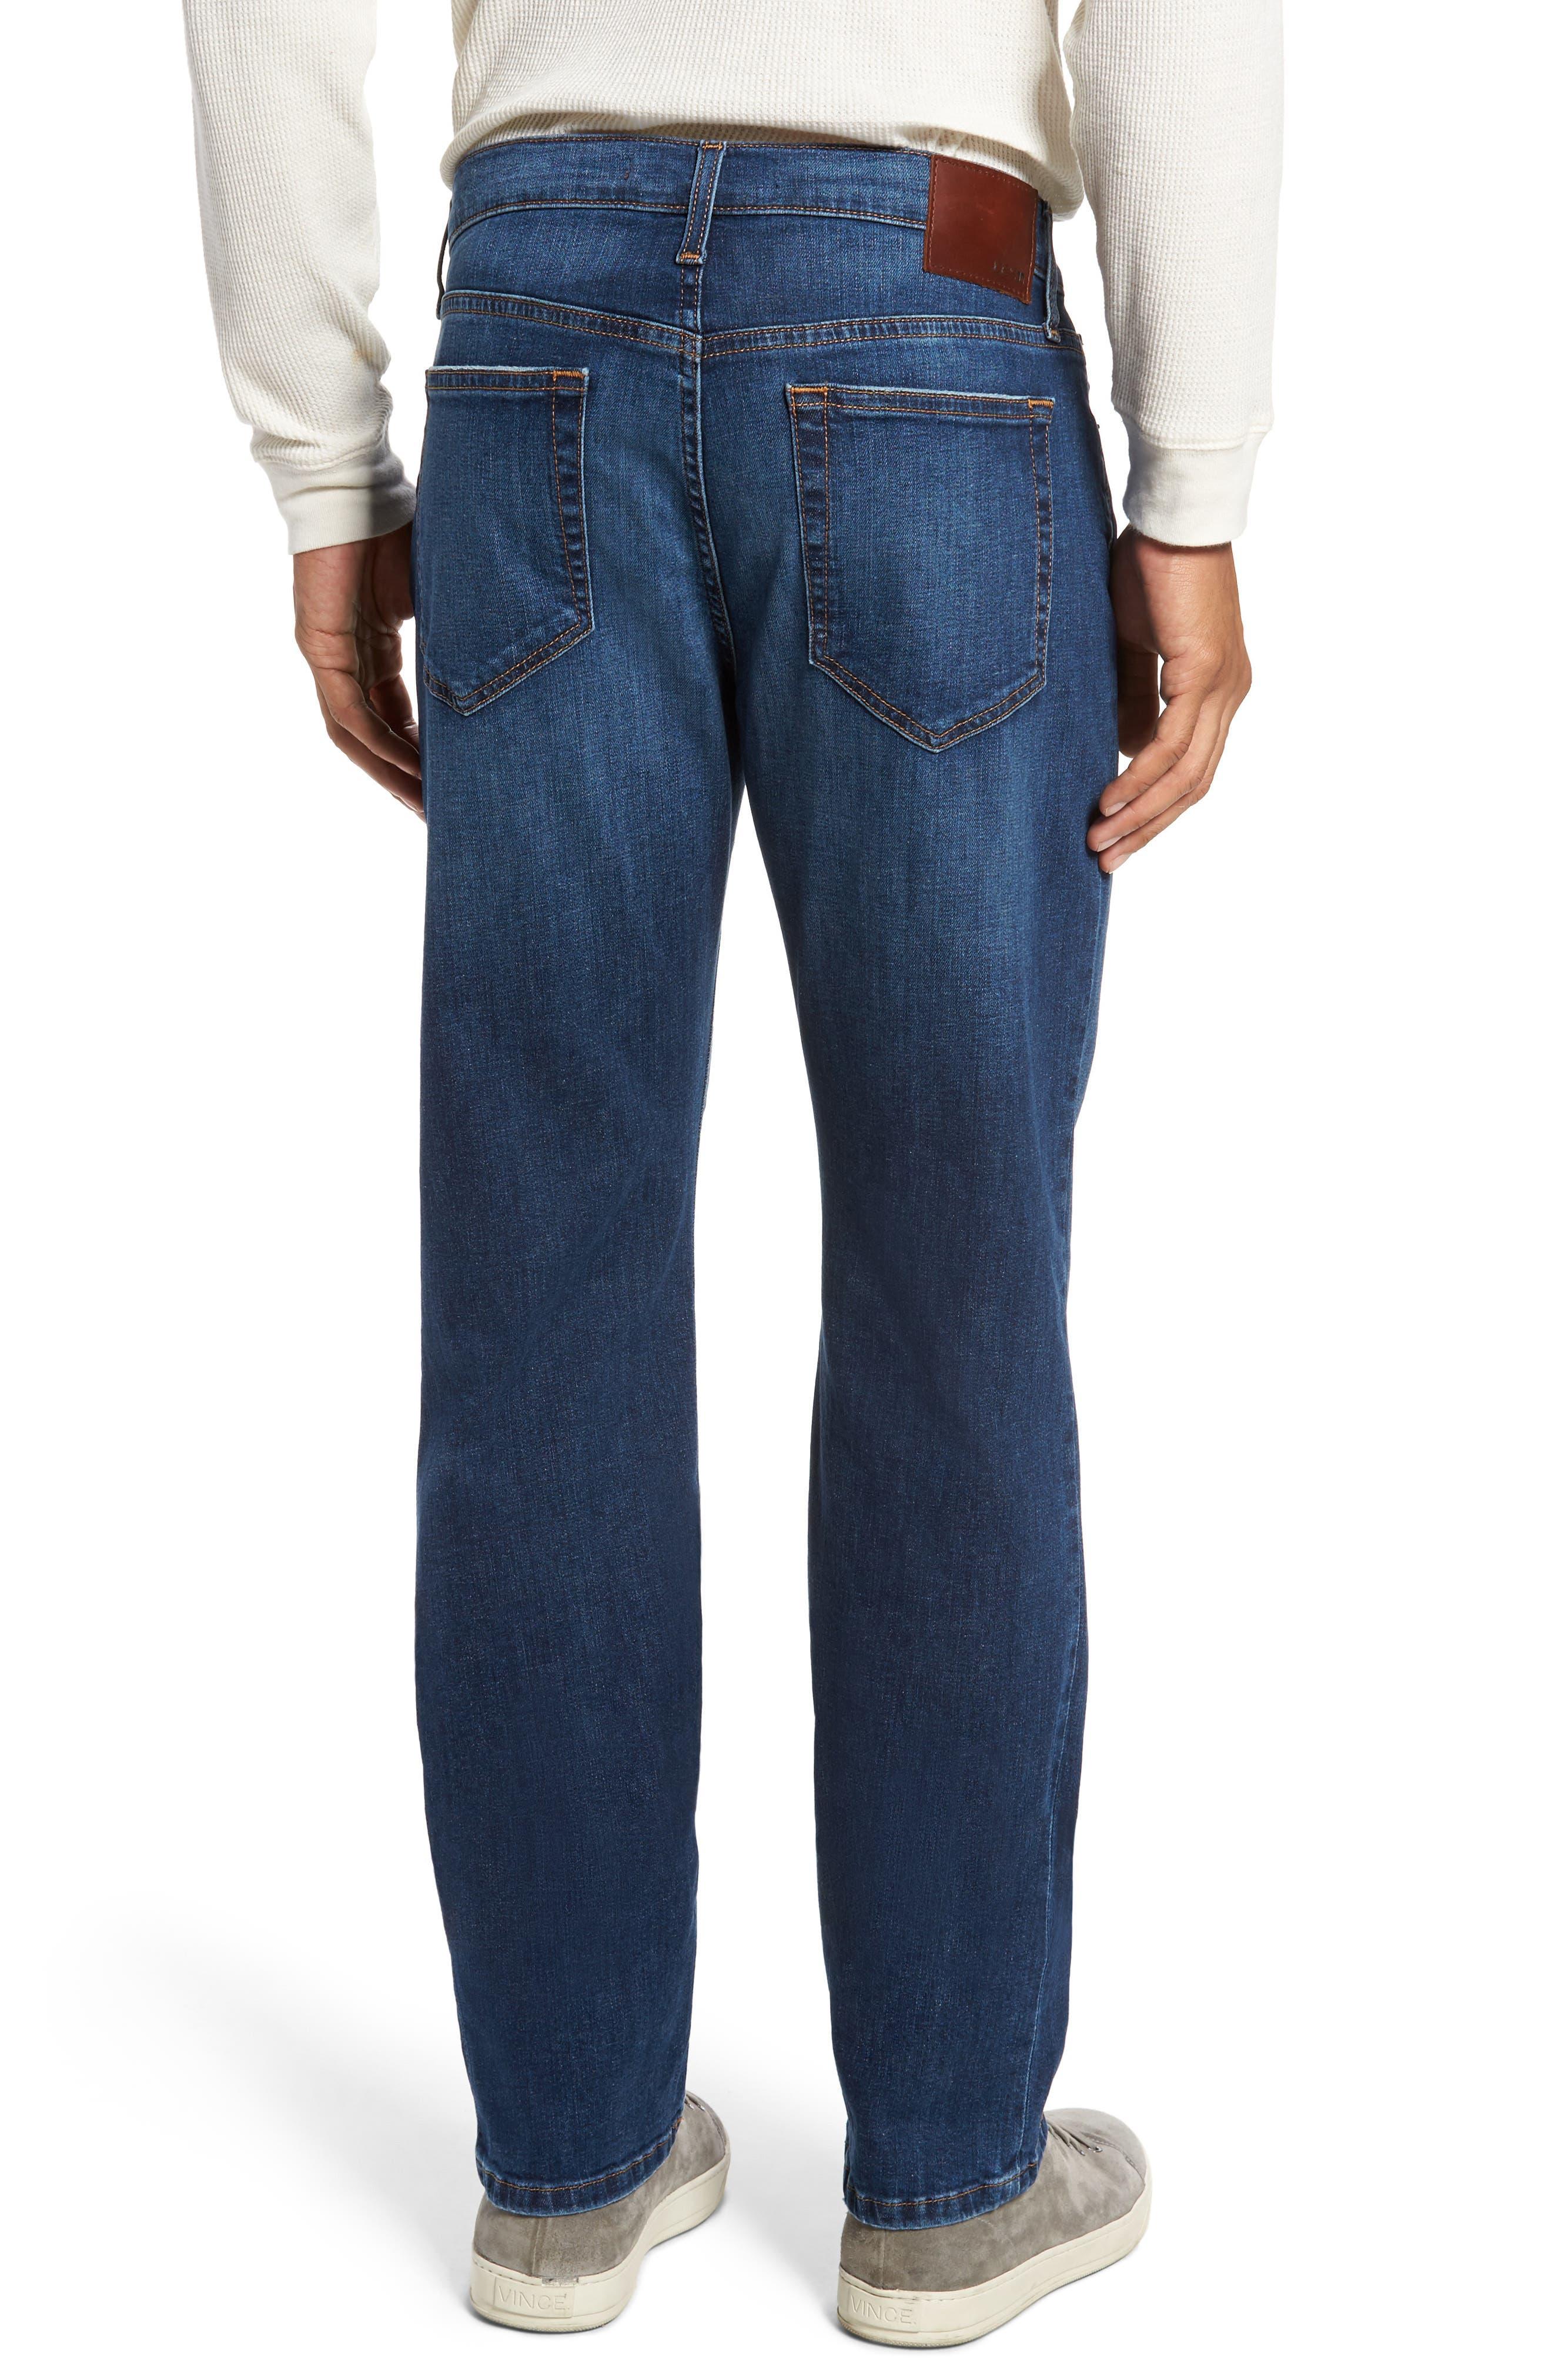 Brixton Slim Straight Leg Jeans,                             Alternate thumbnail 2, color,                             Bradlee